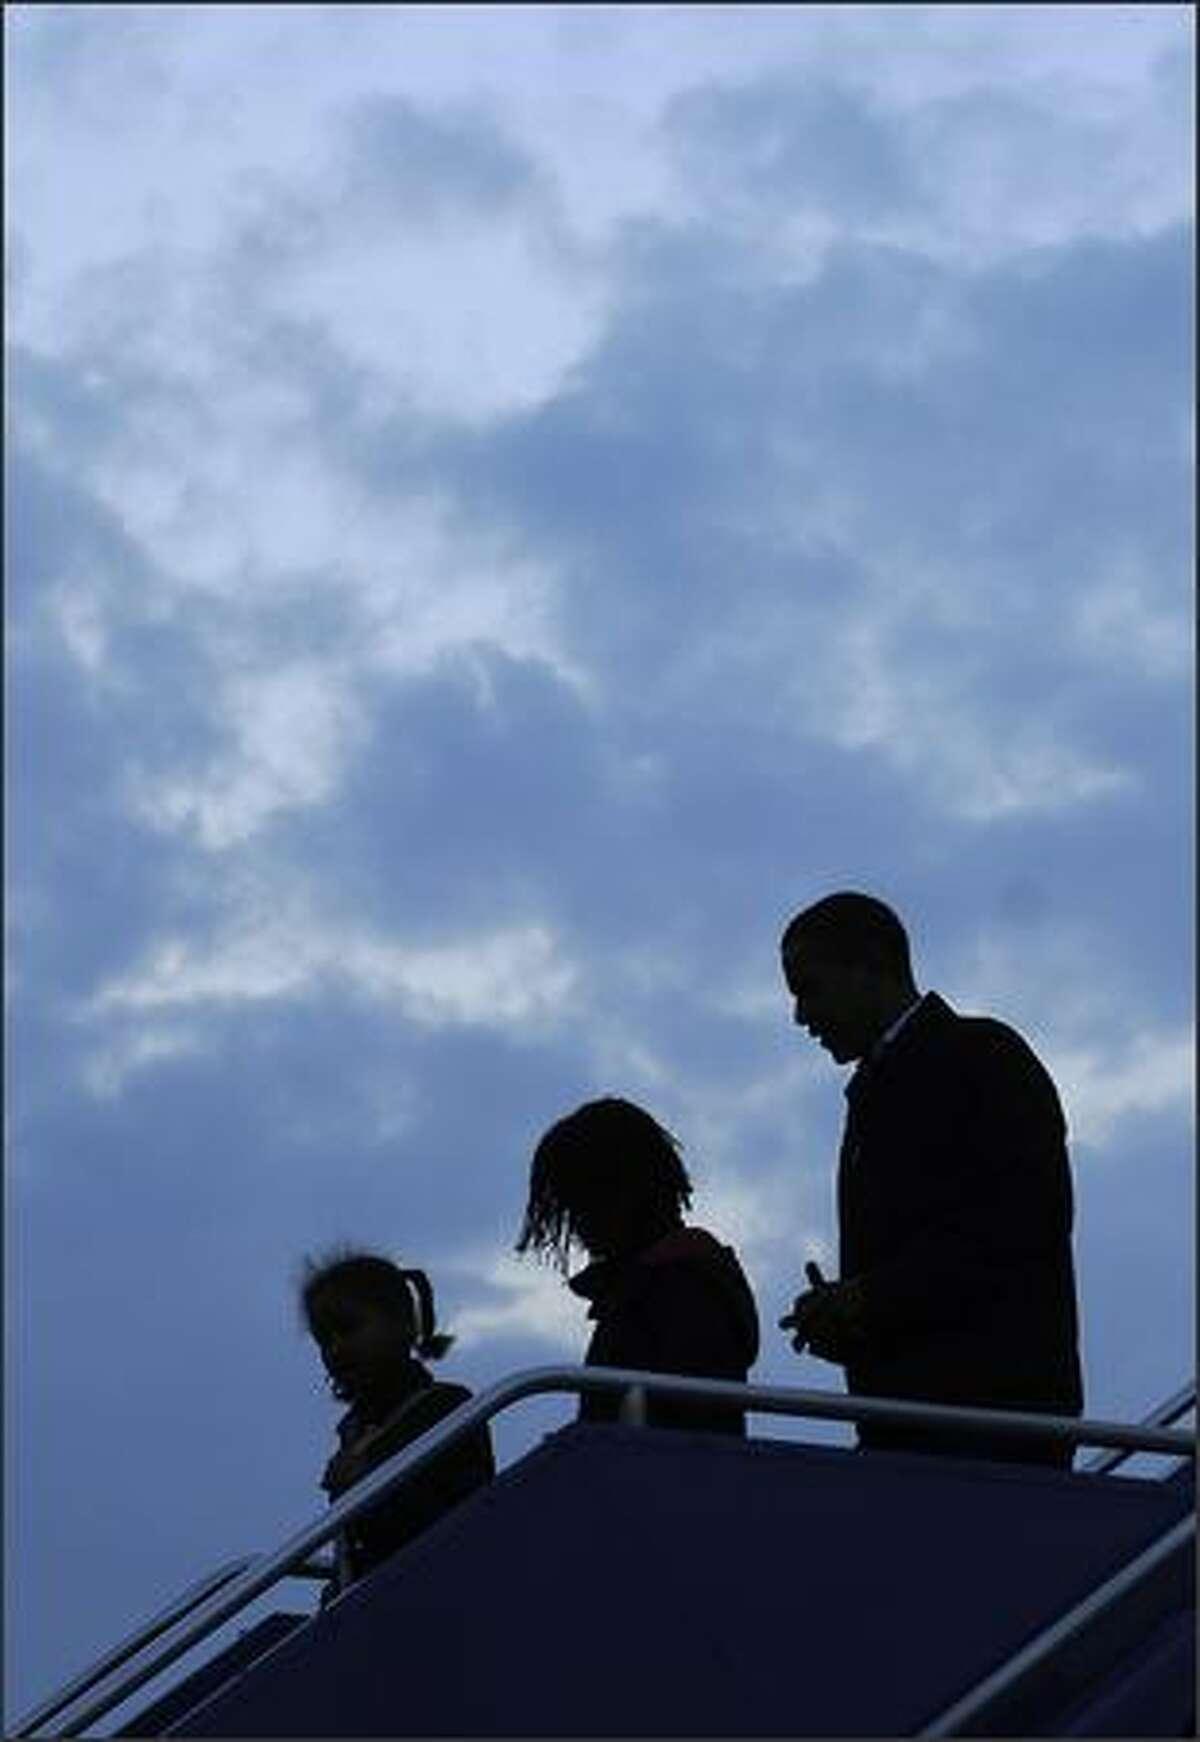 Democratic presidential candidate Illinois Senator Barack Obama and his daughters Sasha, 7, and Malia, 10, disembark from his campaign plane in Columbus, Ohio, on Sunday.